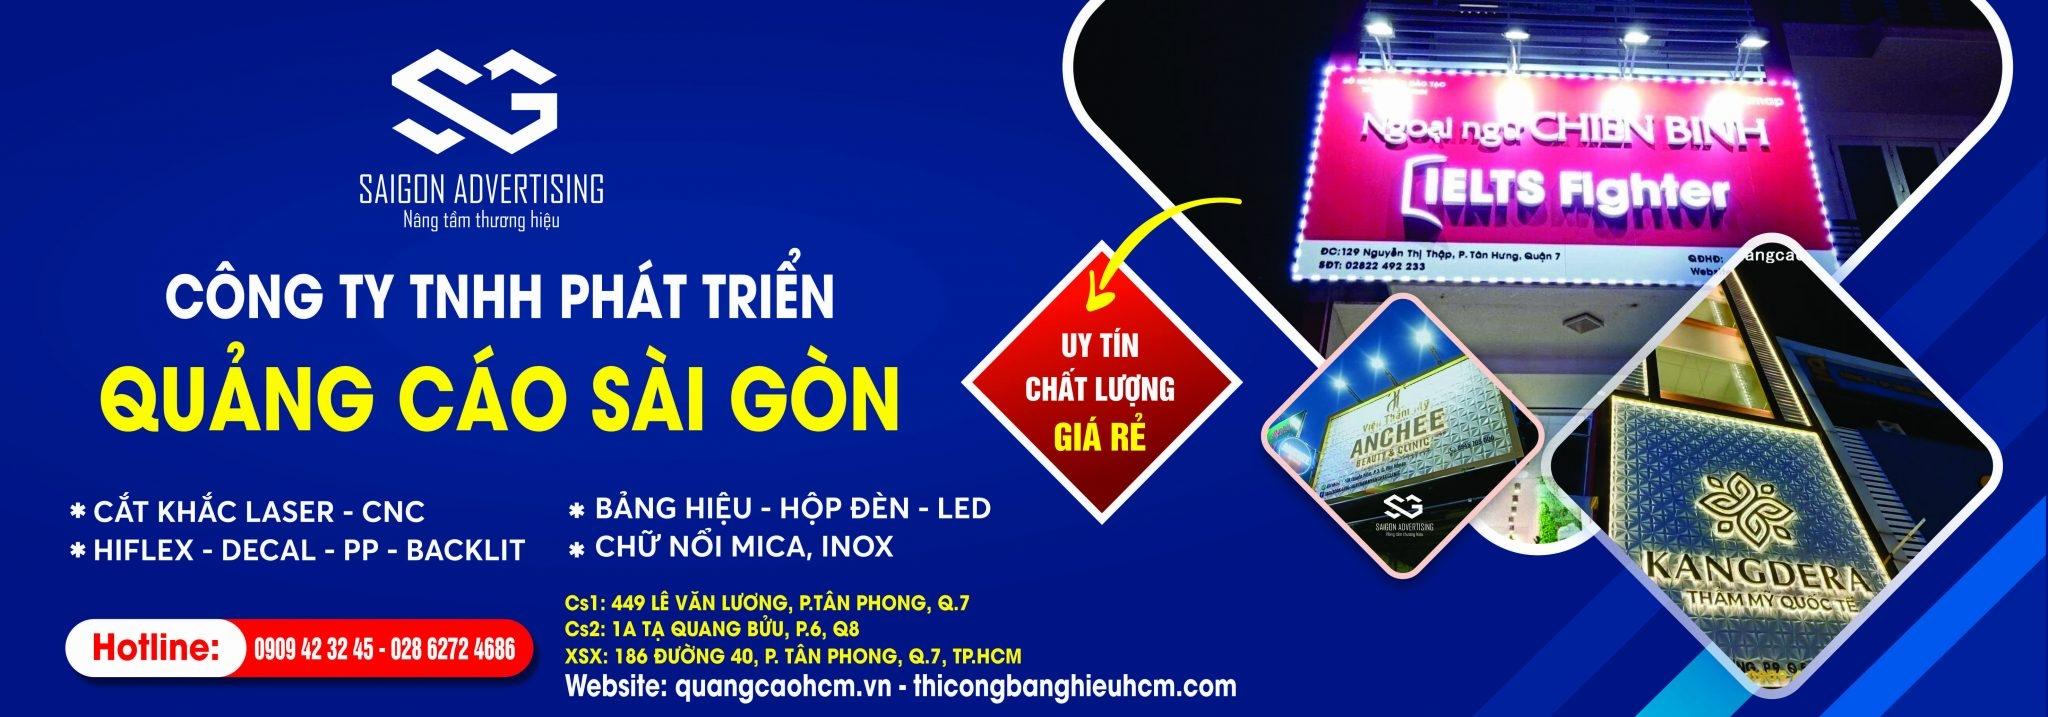 Quảng Cáo HCM (@quangcaohcm) Cover Image